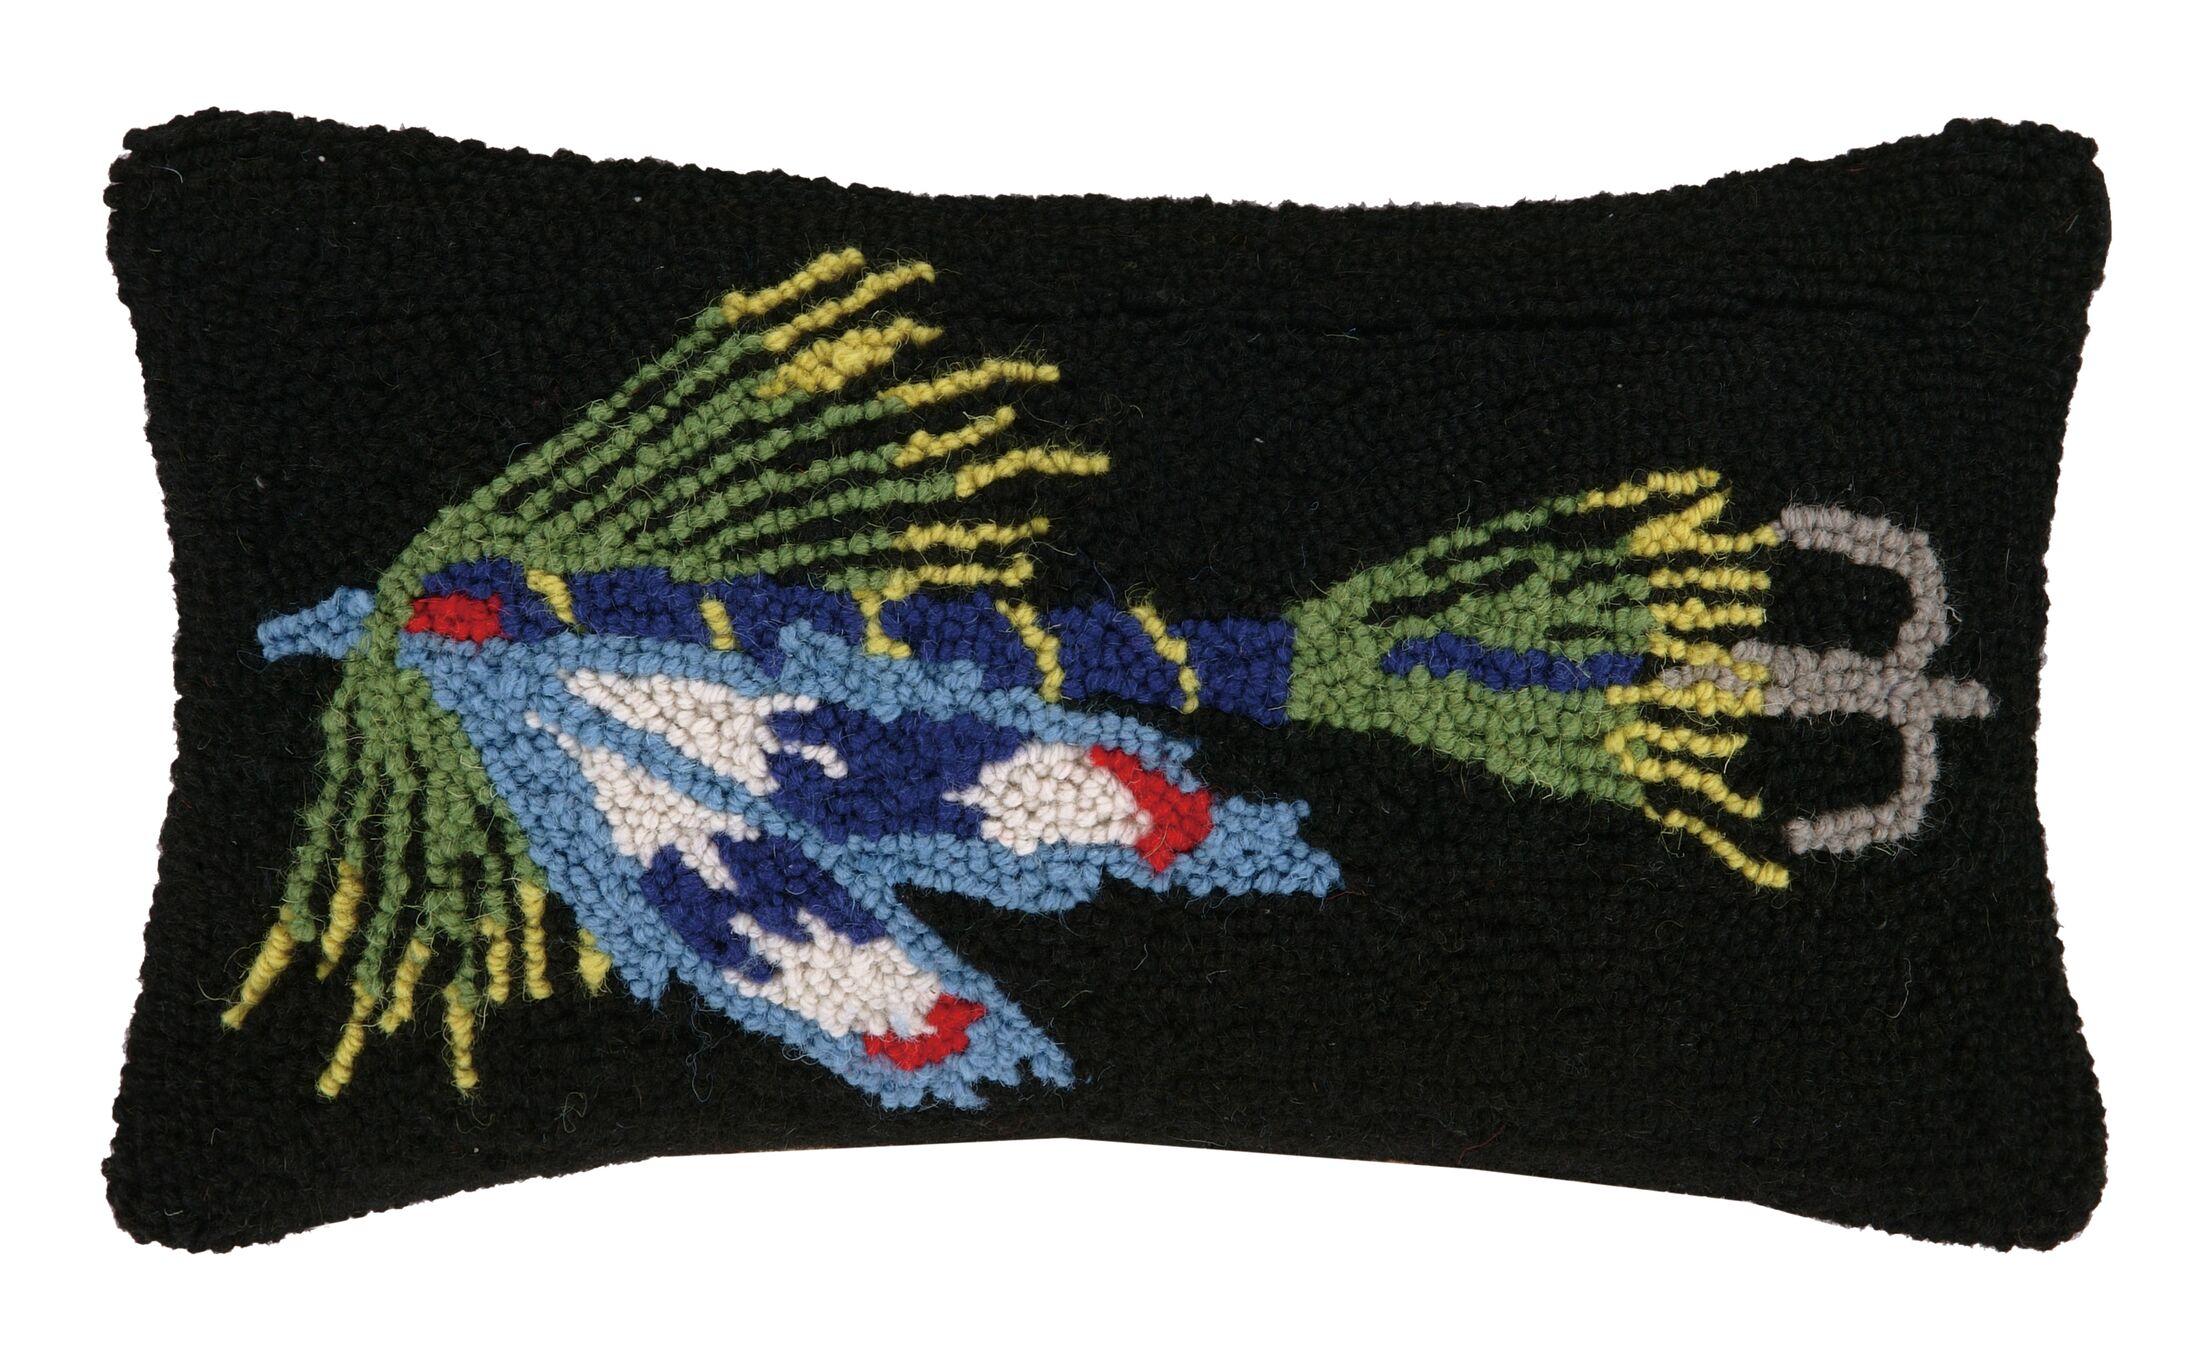 Fishing Lure in Hook Wool Lumbar Pillow